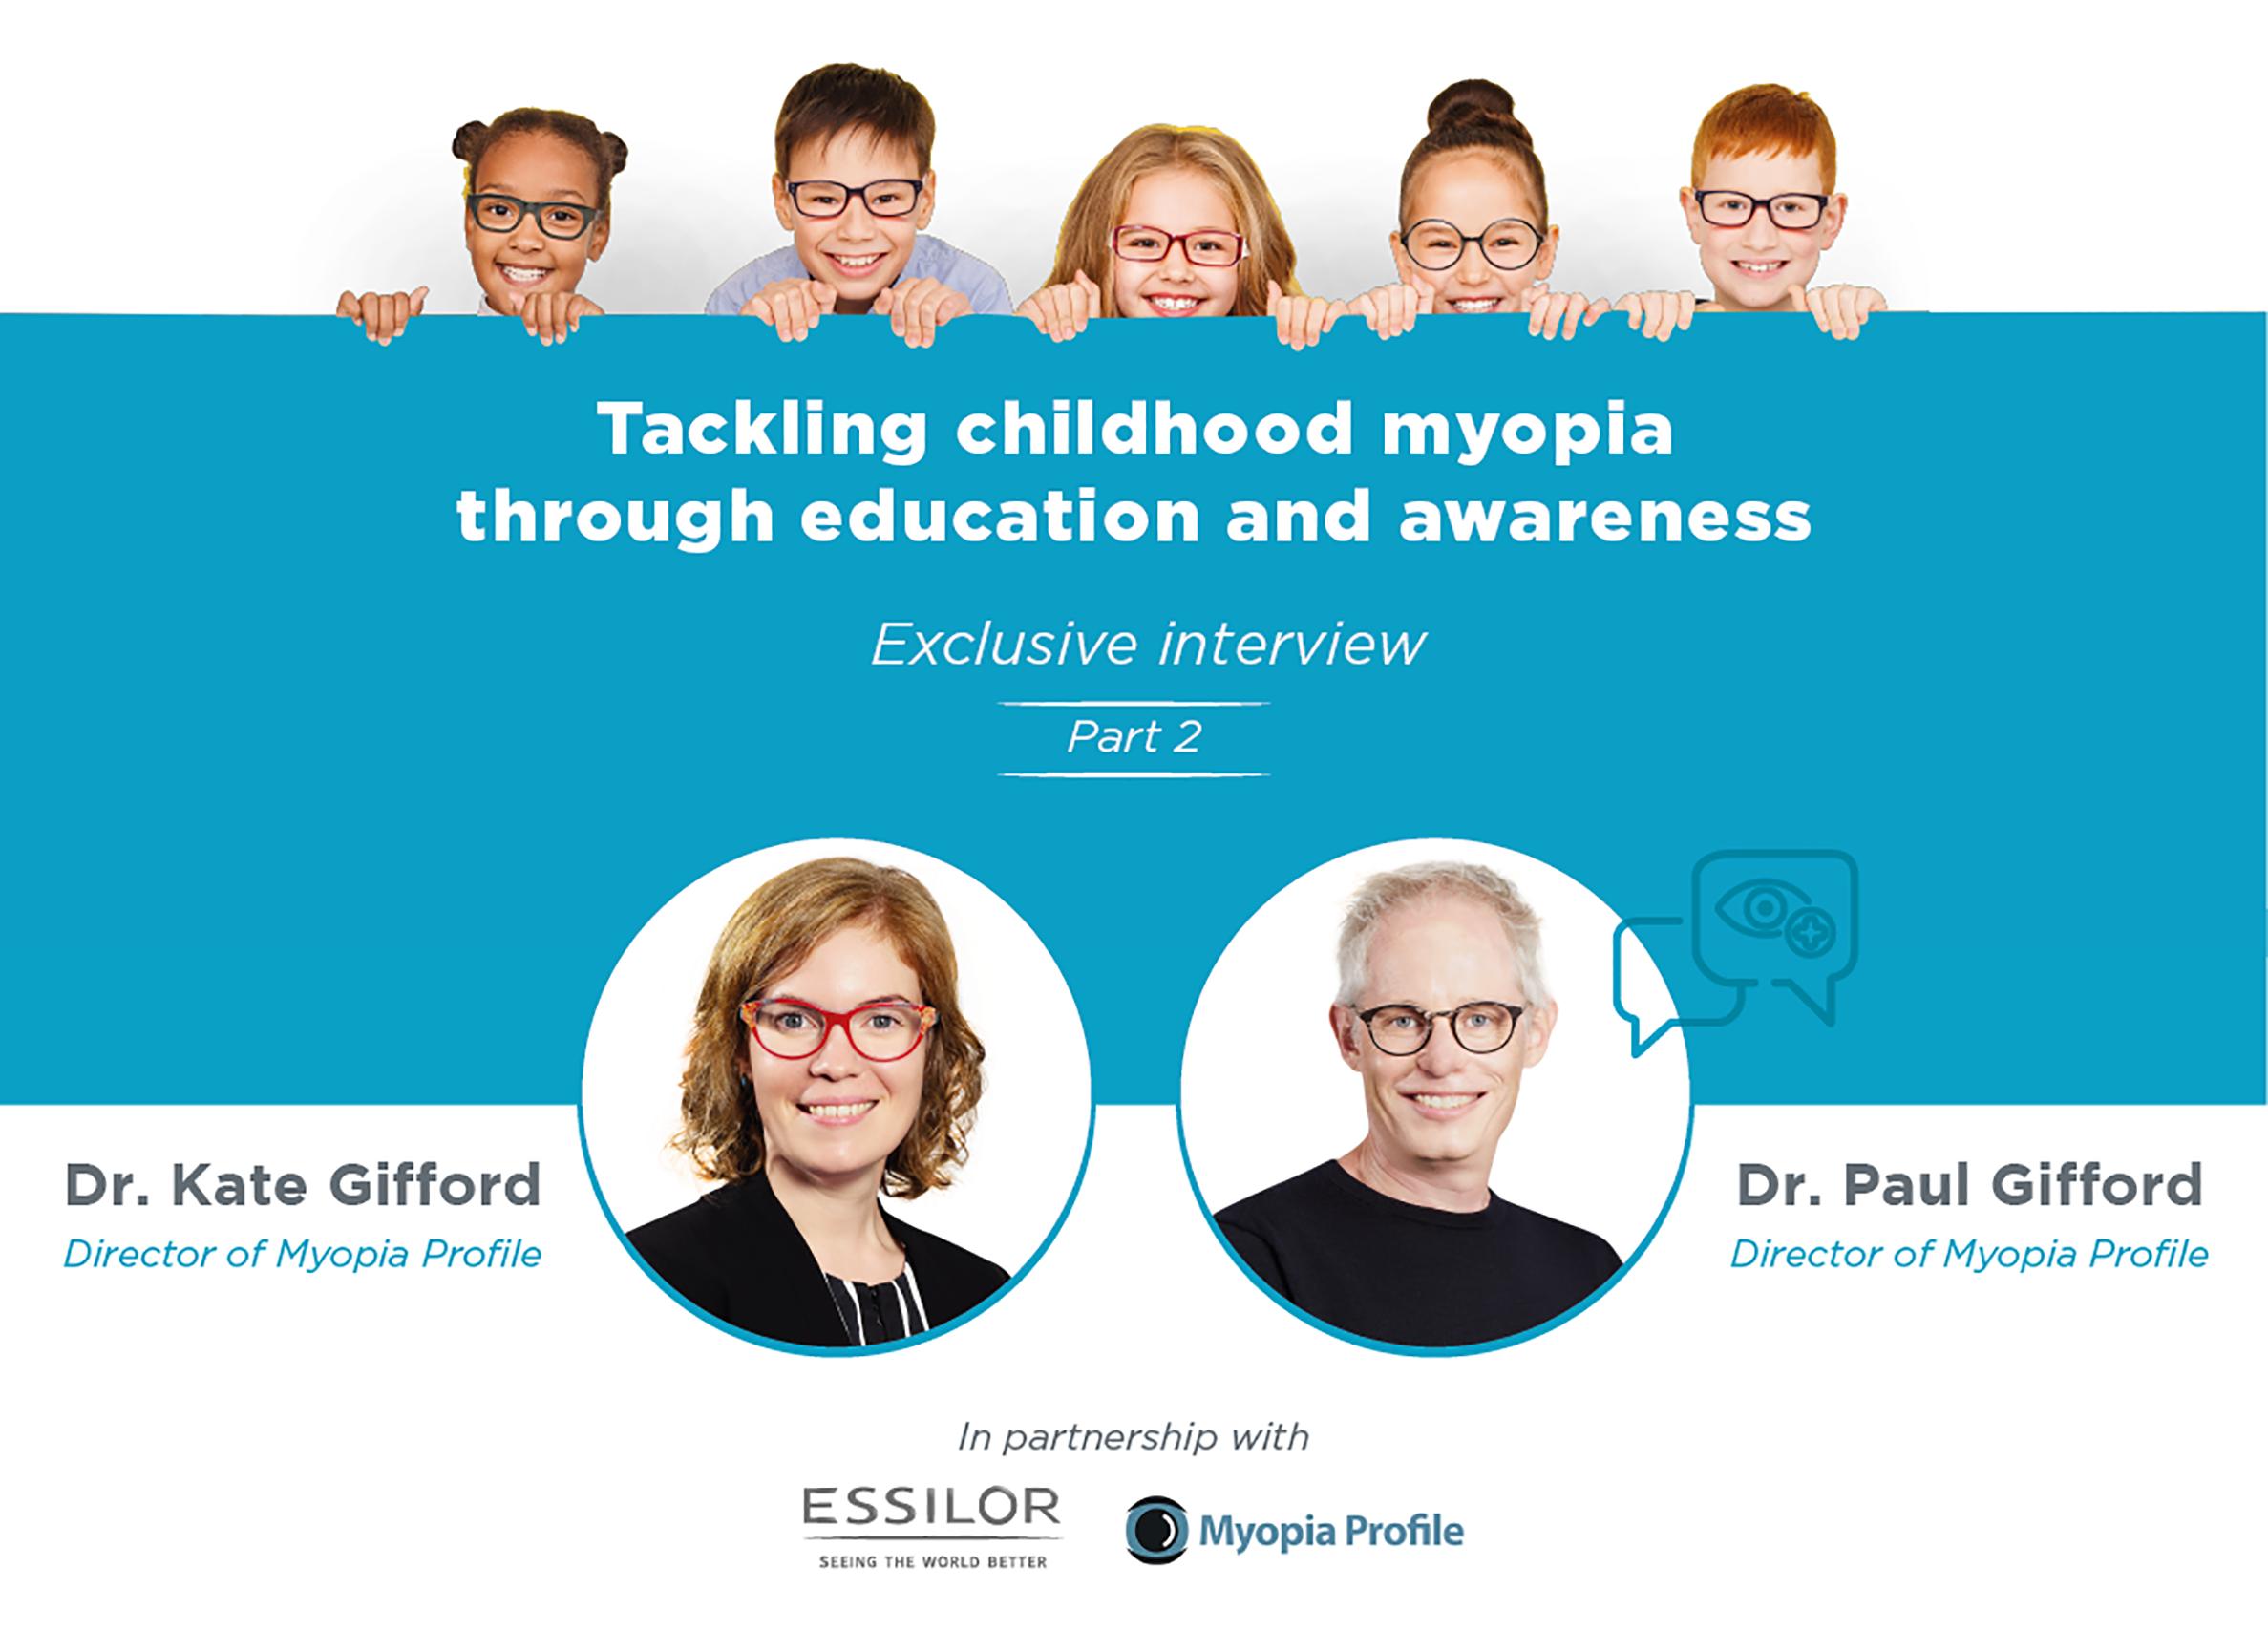 Tackling childhood myopia through education and awareness